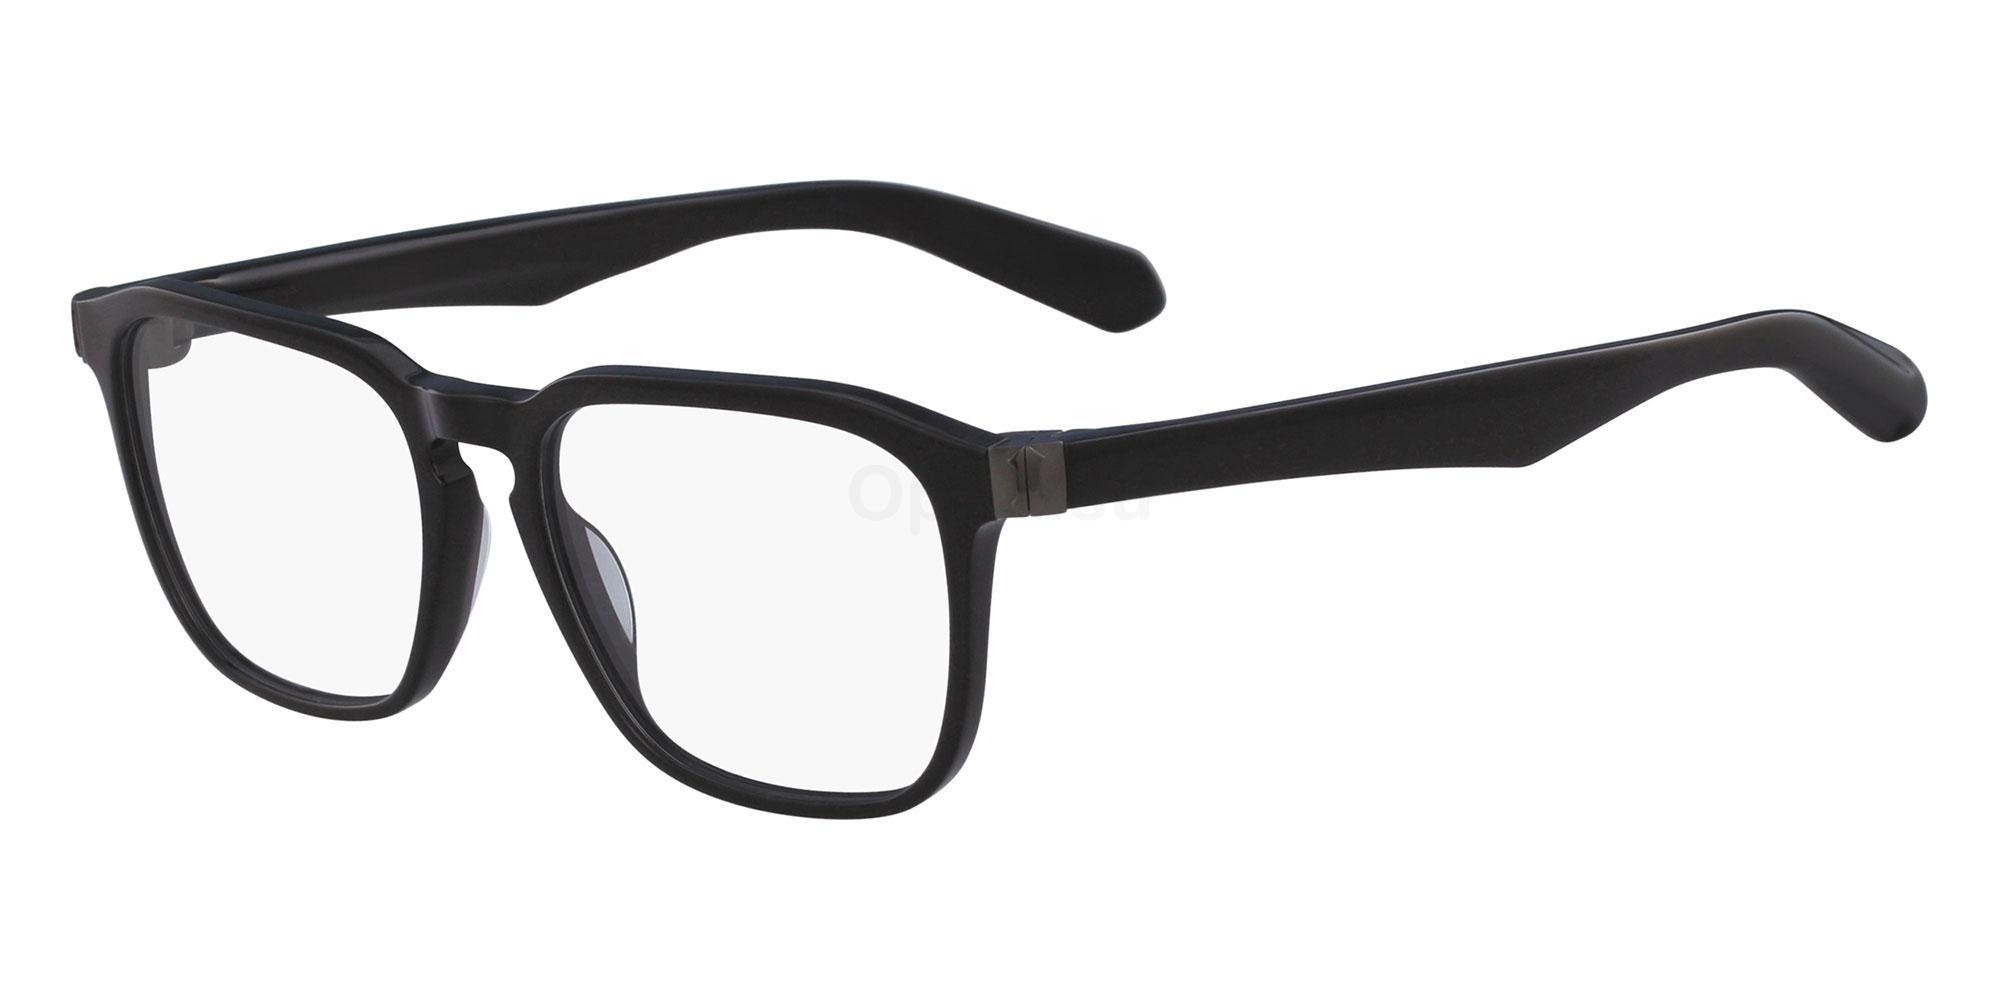 001 DR179 EDGAR Glasses, Dragon